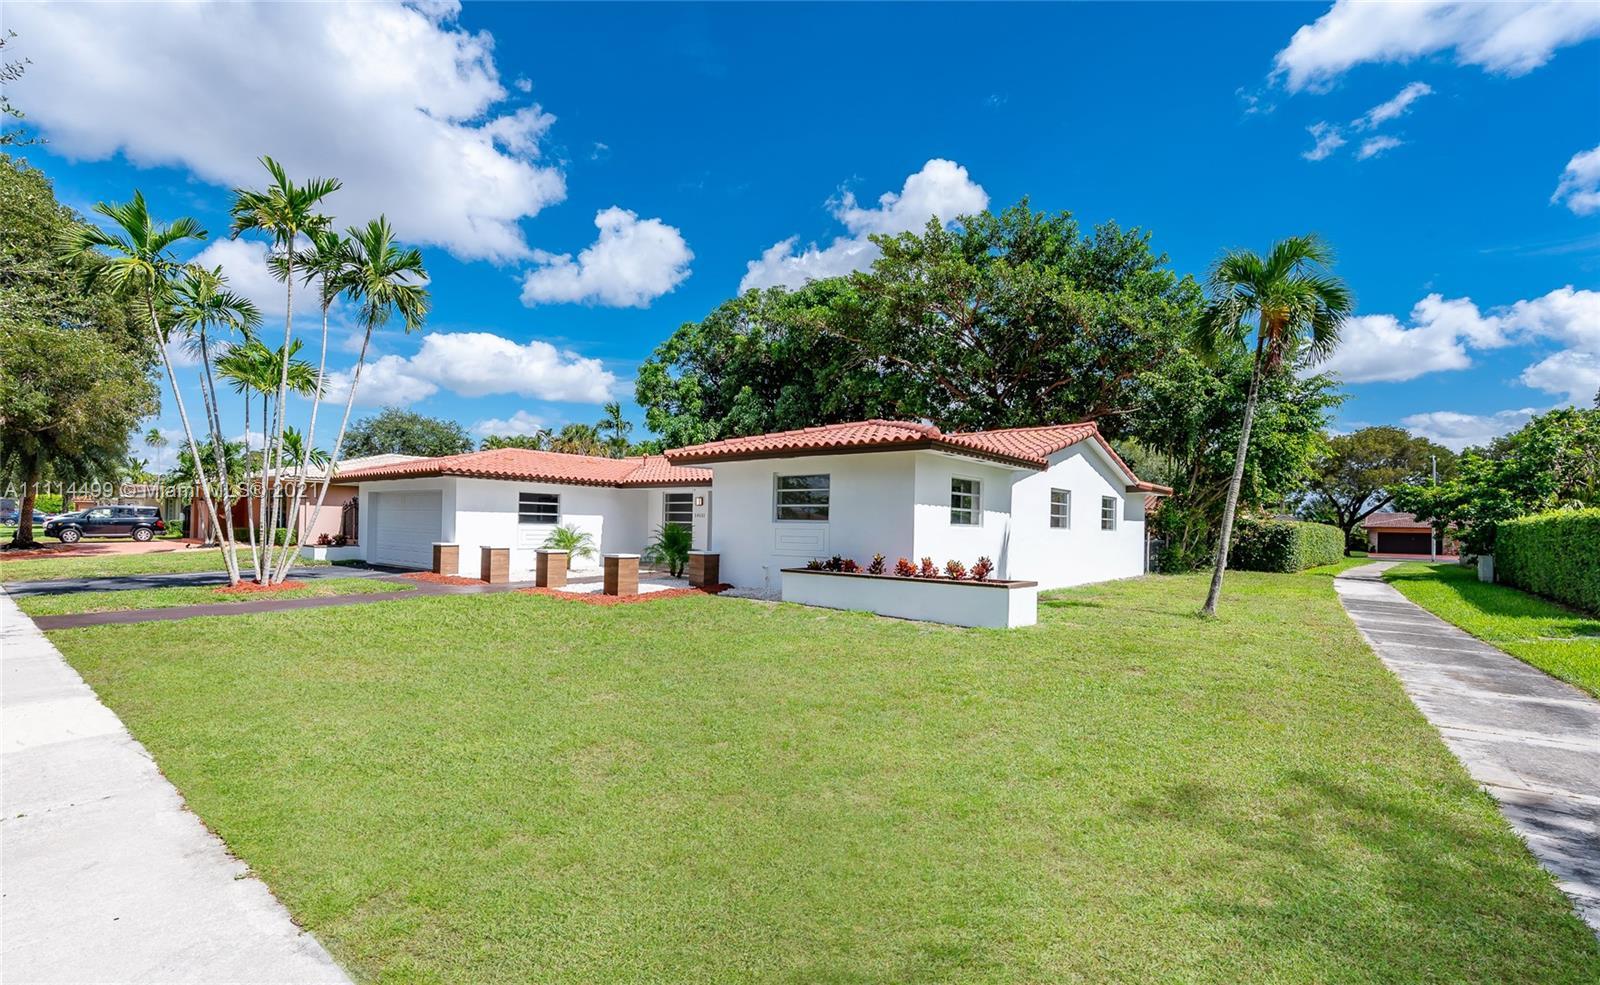 Single Family Home,For Sale,14111 Cypress Ct, Miami Lakes, Florida 33014,Brickell,realty,broker,condos near me